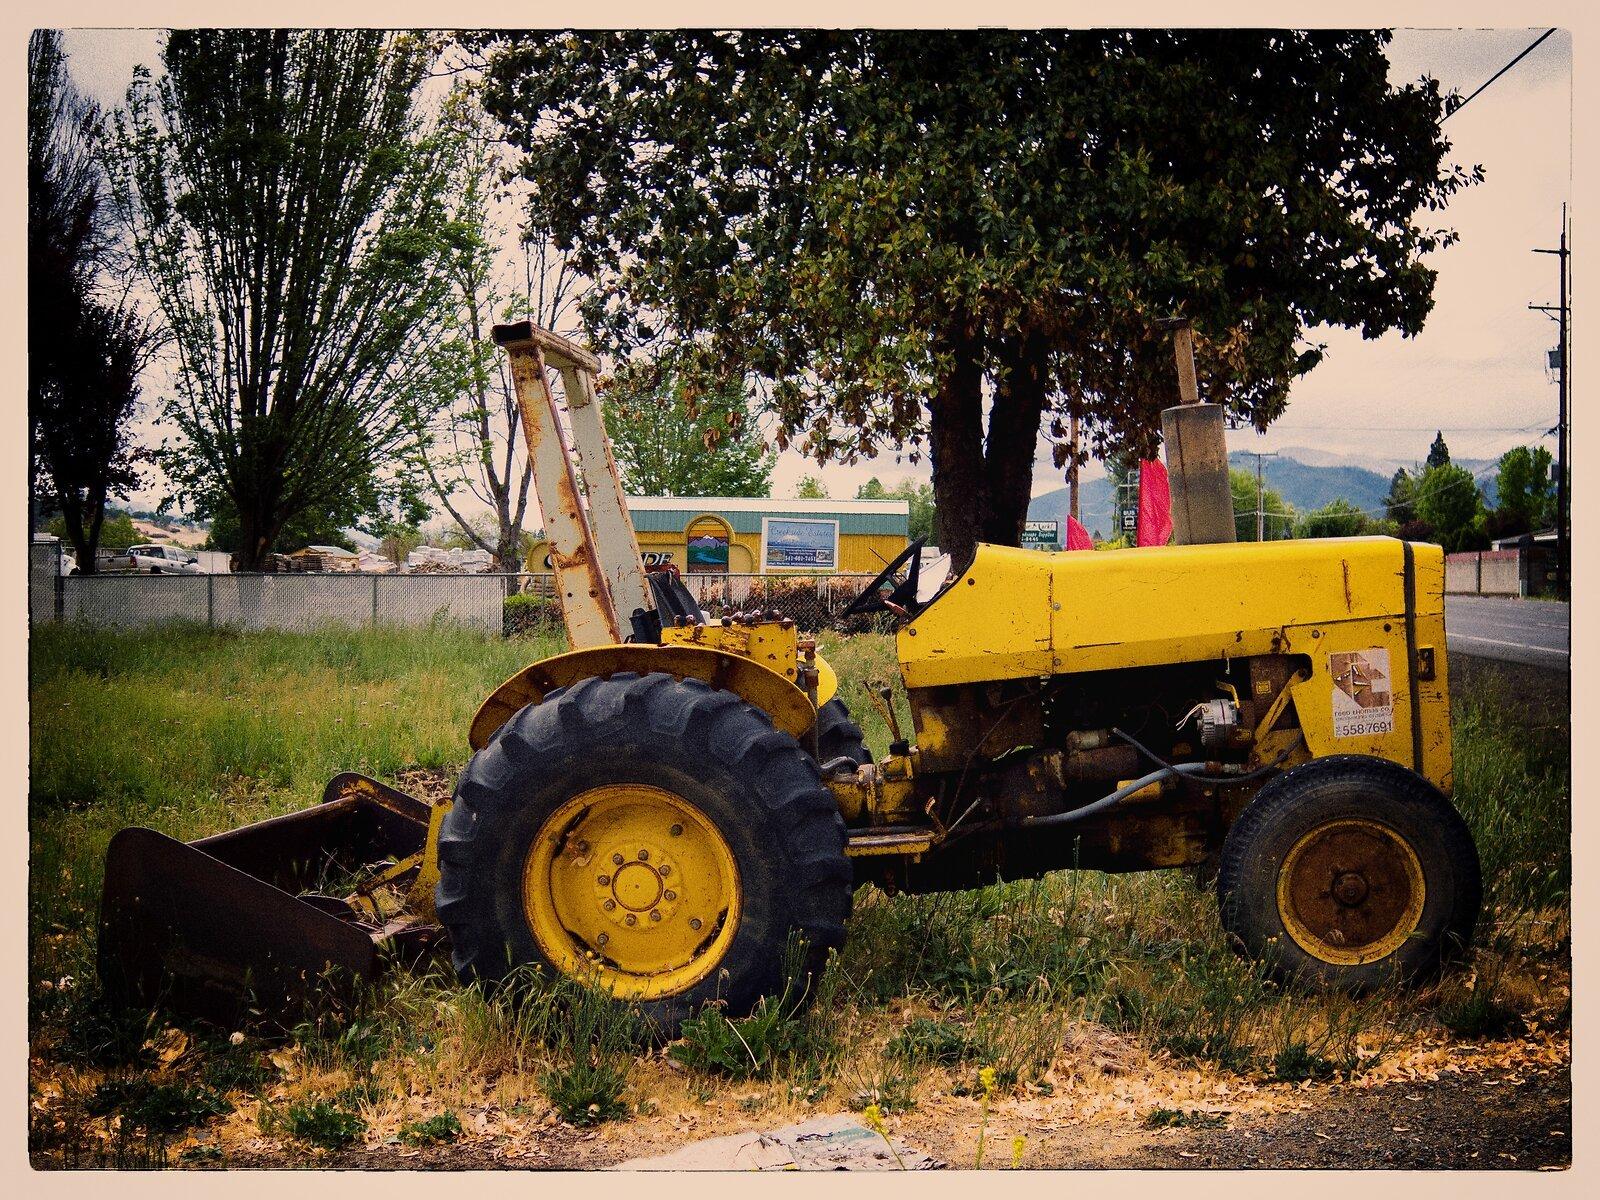 Q7_May20_21_tractor(color.efex).jpg